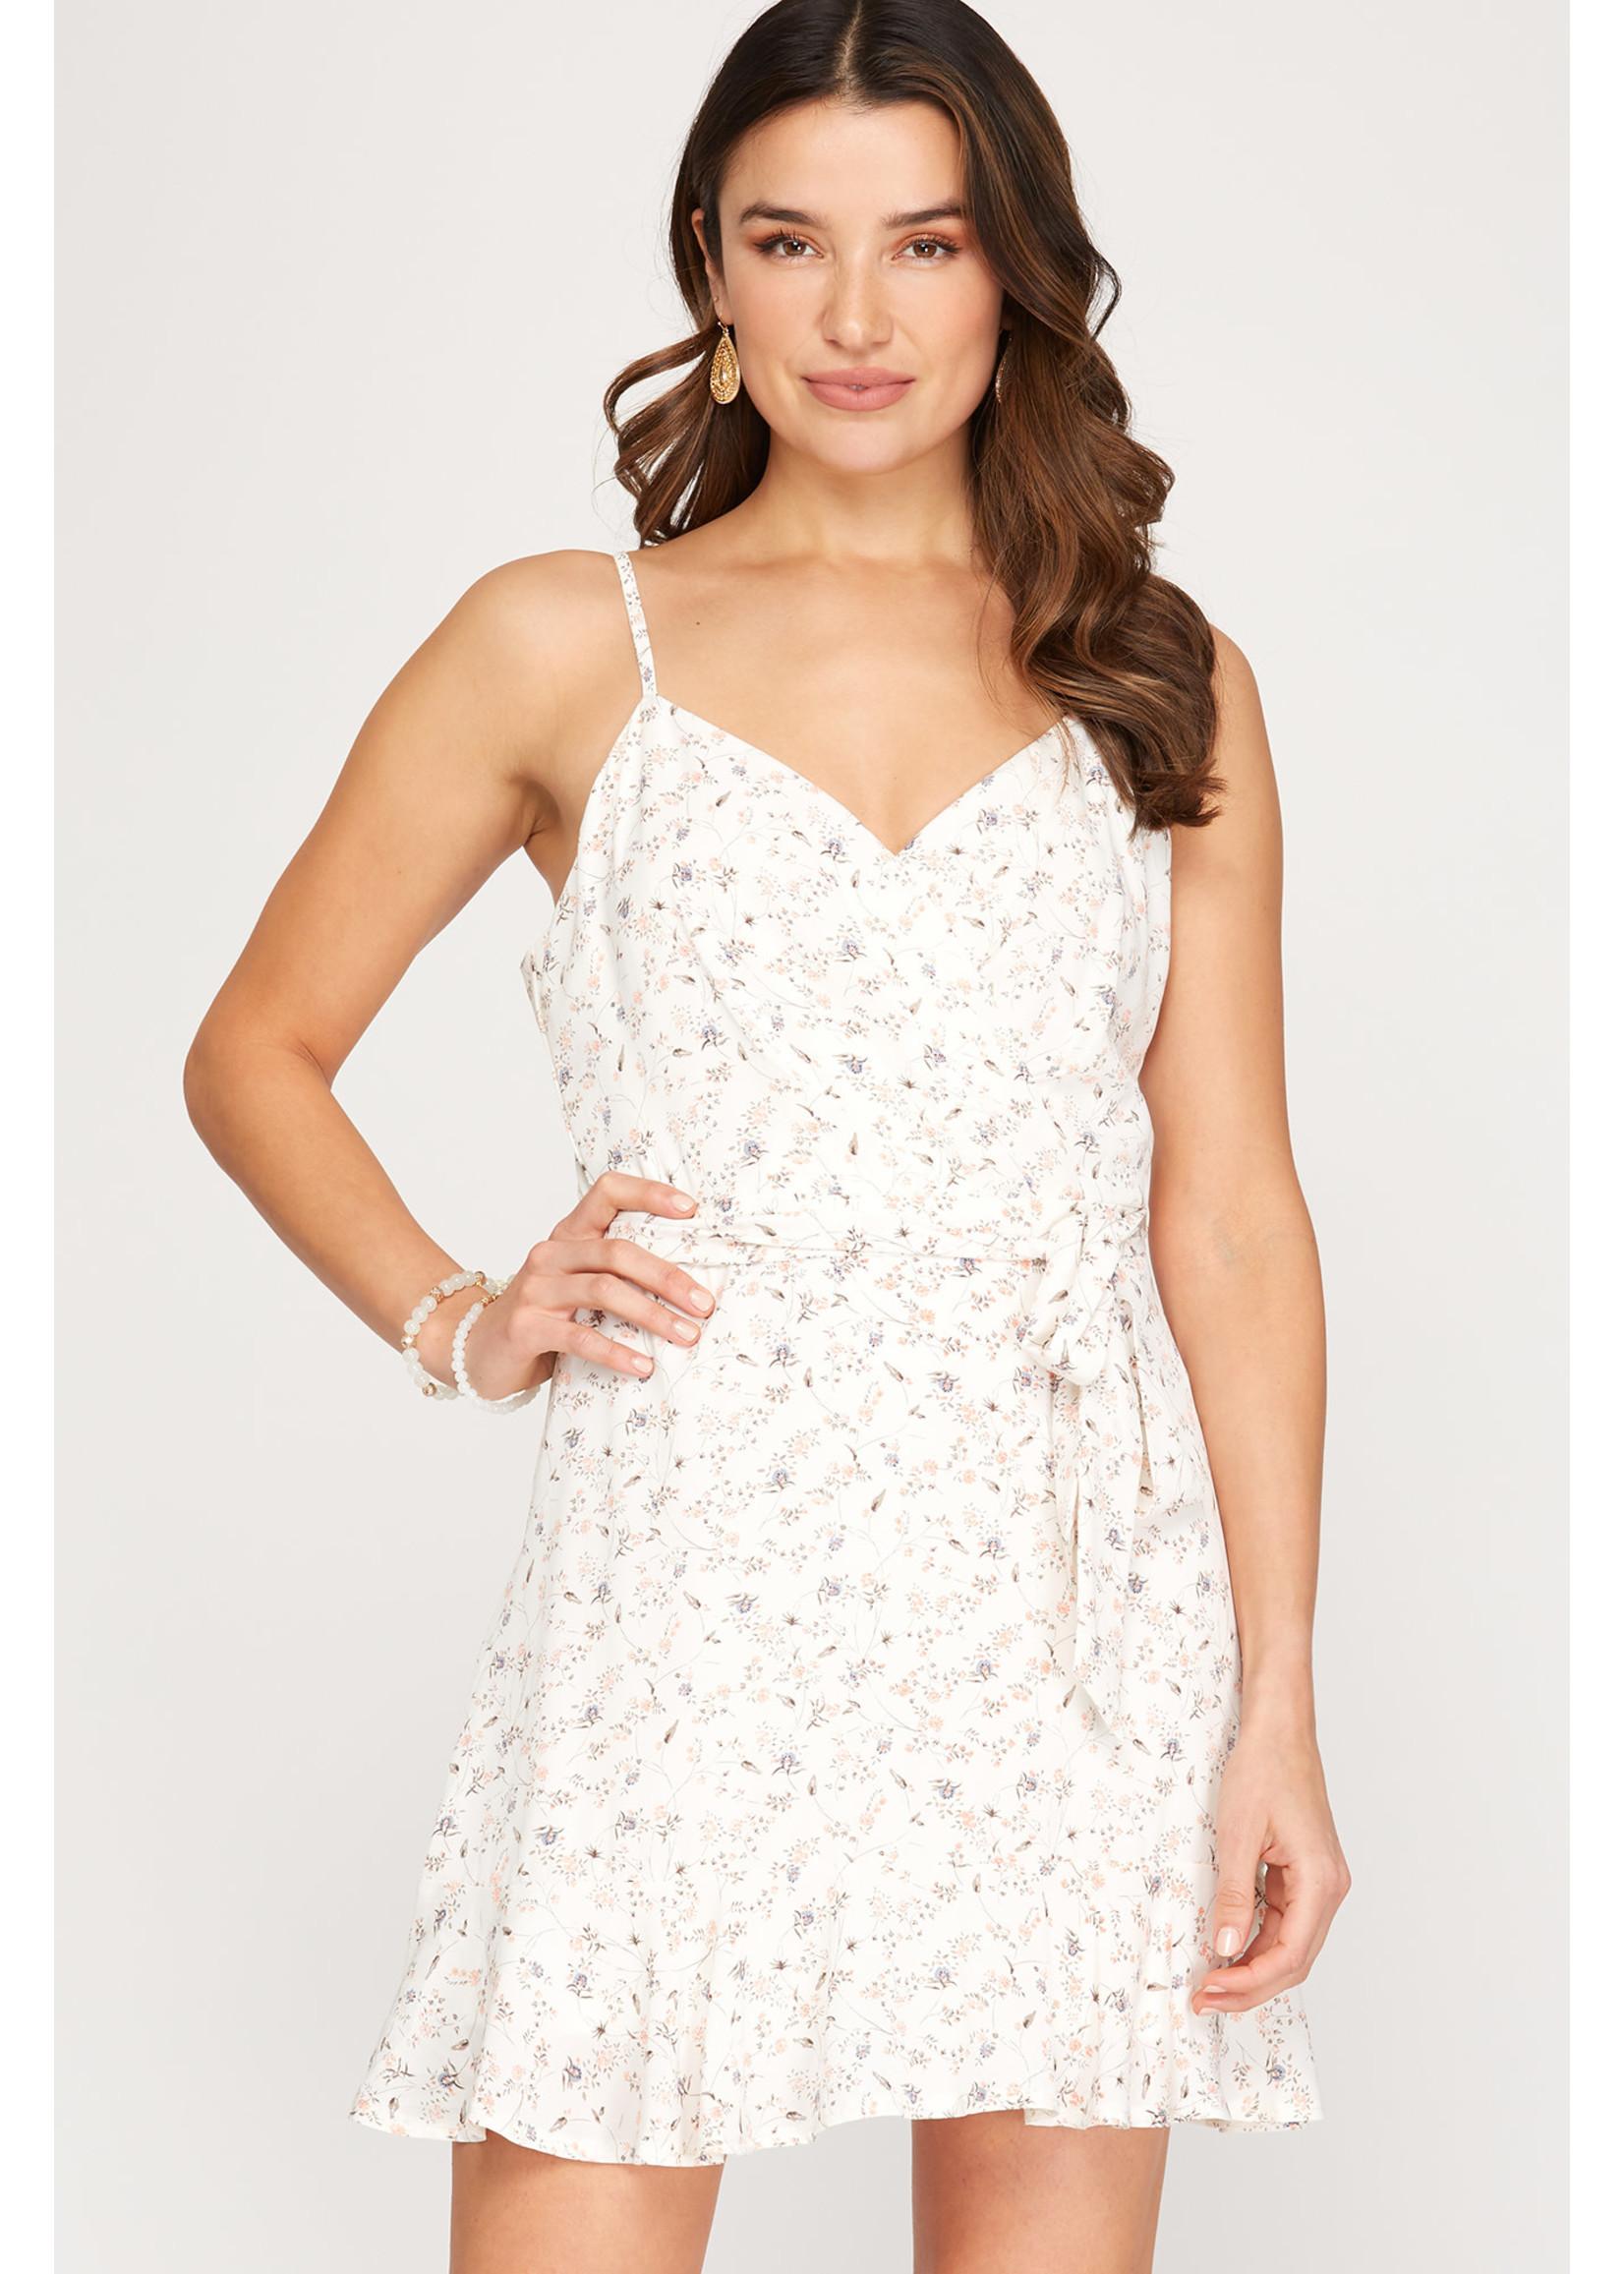 She & Sky Cream Printed Dress